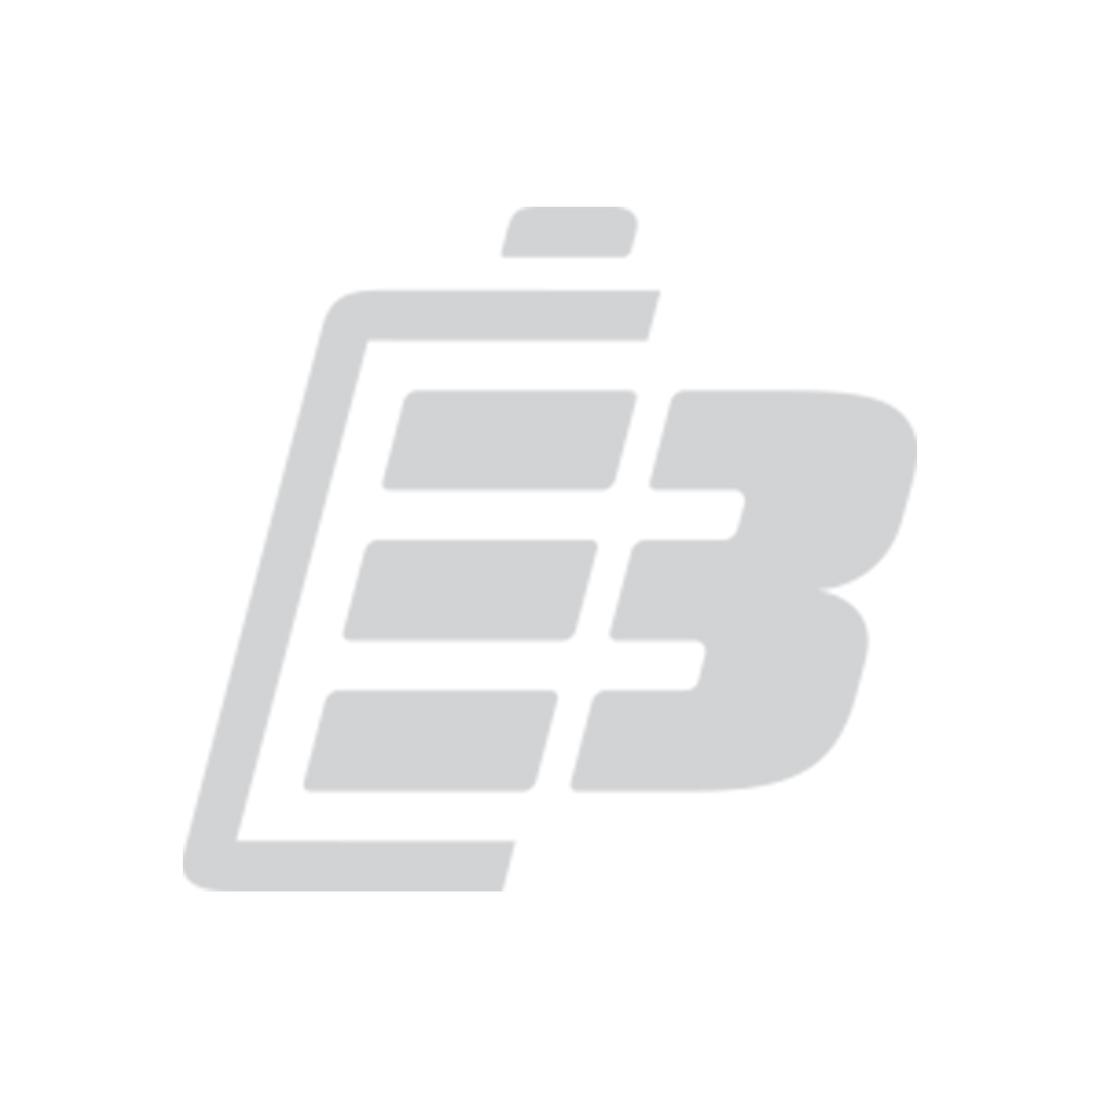 Two-Way radio battery Icom CM-166_1